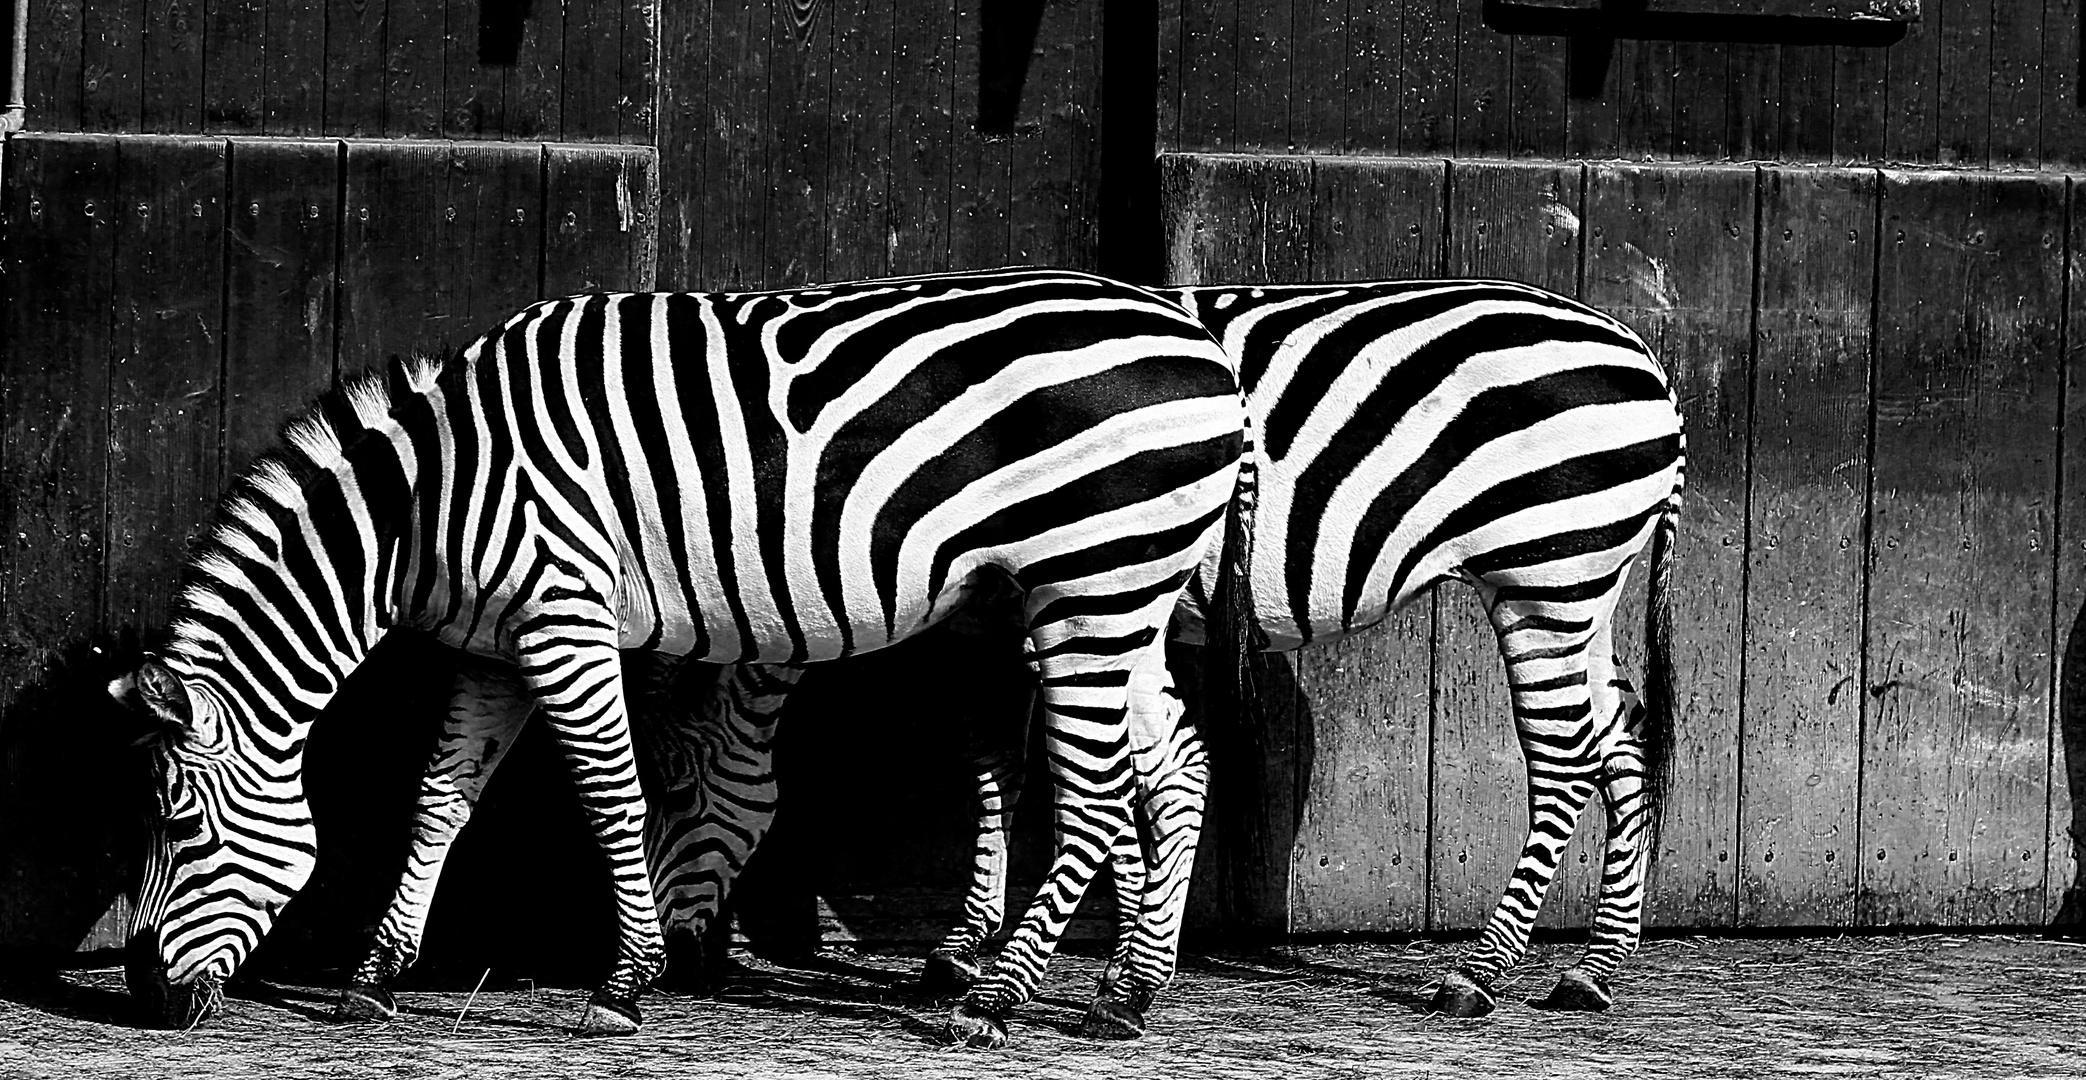 Gibt es Zwillinge unter Zebras ??